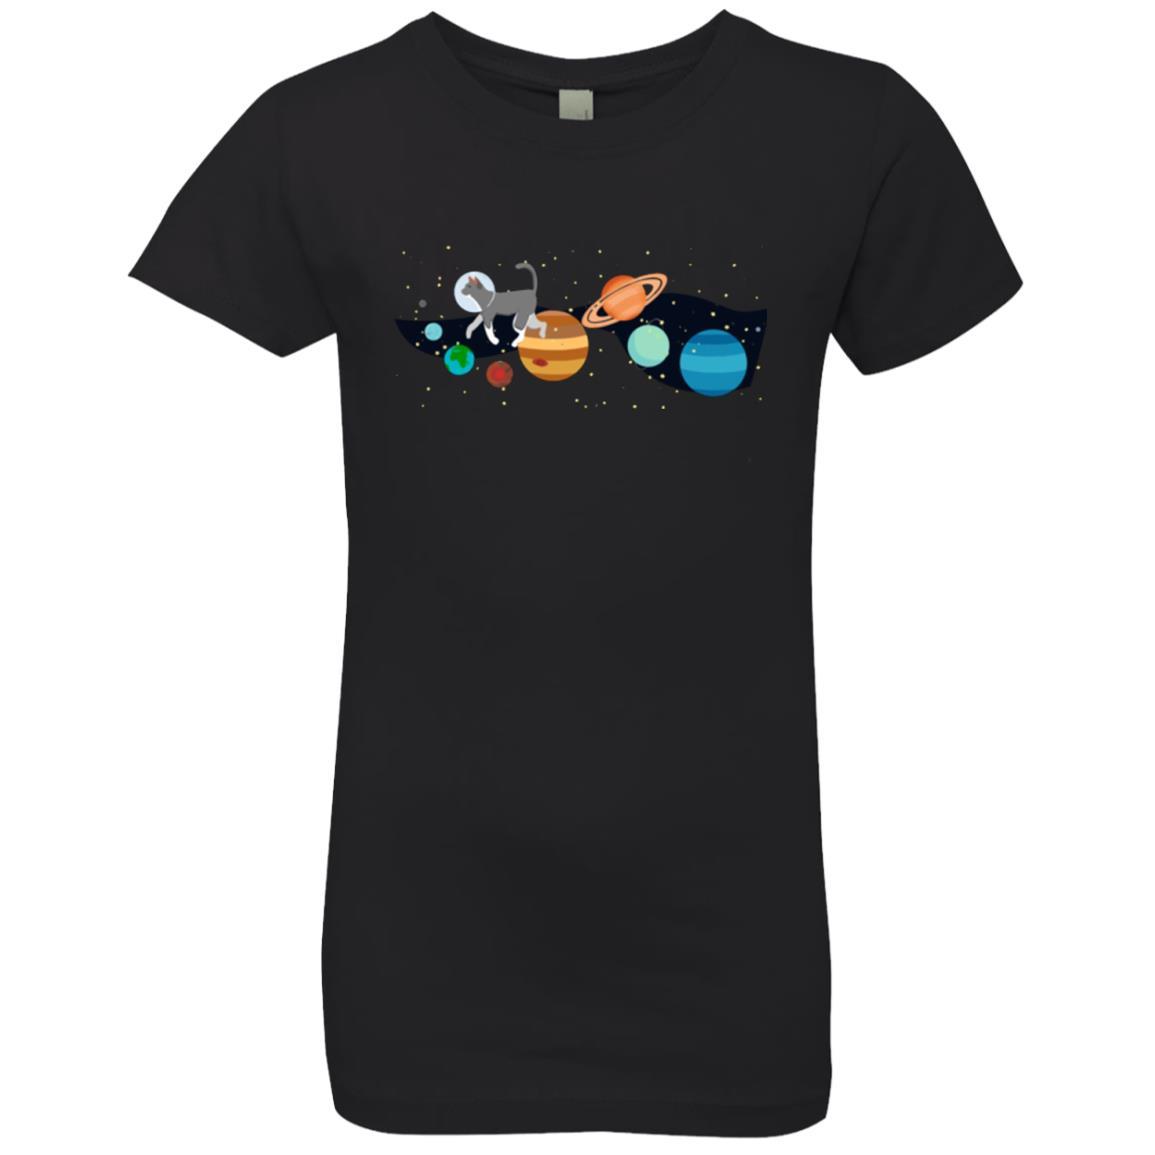 Space Traveler Cat Girls' Premium T-Shirt - iHeartCats.com